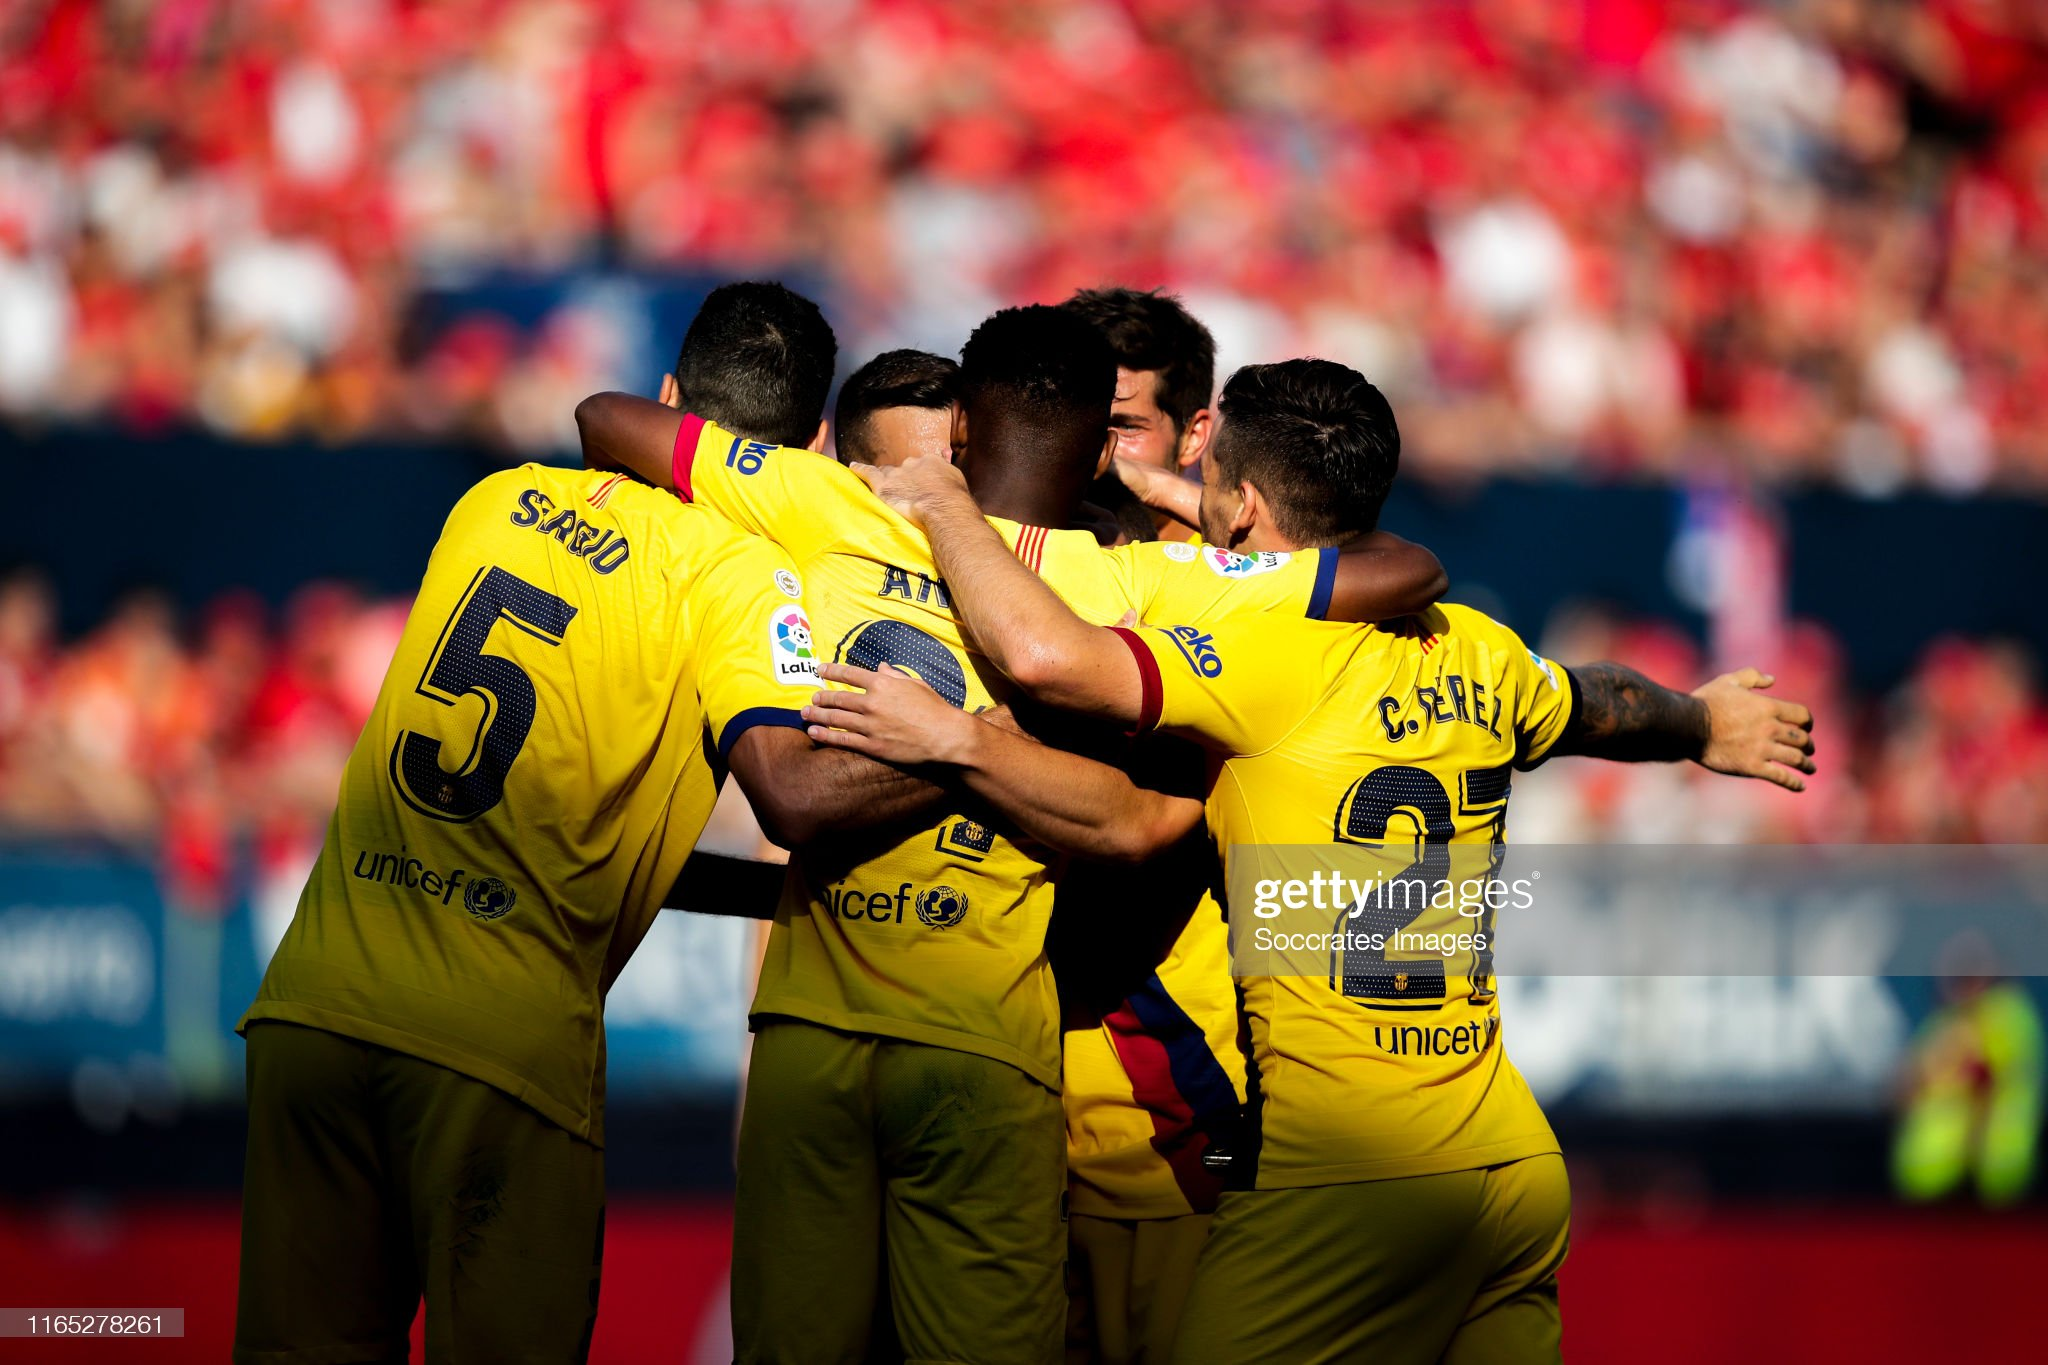 صور مباراة : أوساسونا - برشلونة 2-2 ( 31-08-2019 )  Ansu-fati-of-fc-barcelona-sergio-busquets-of-fc-barcelona-jordi-alba-picture-id1165278261?s=2048x2048